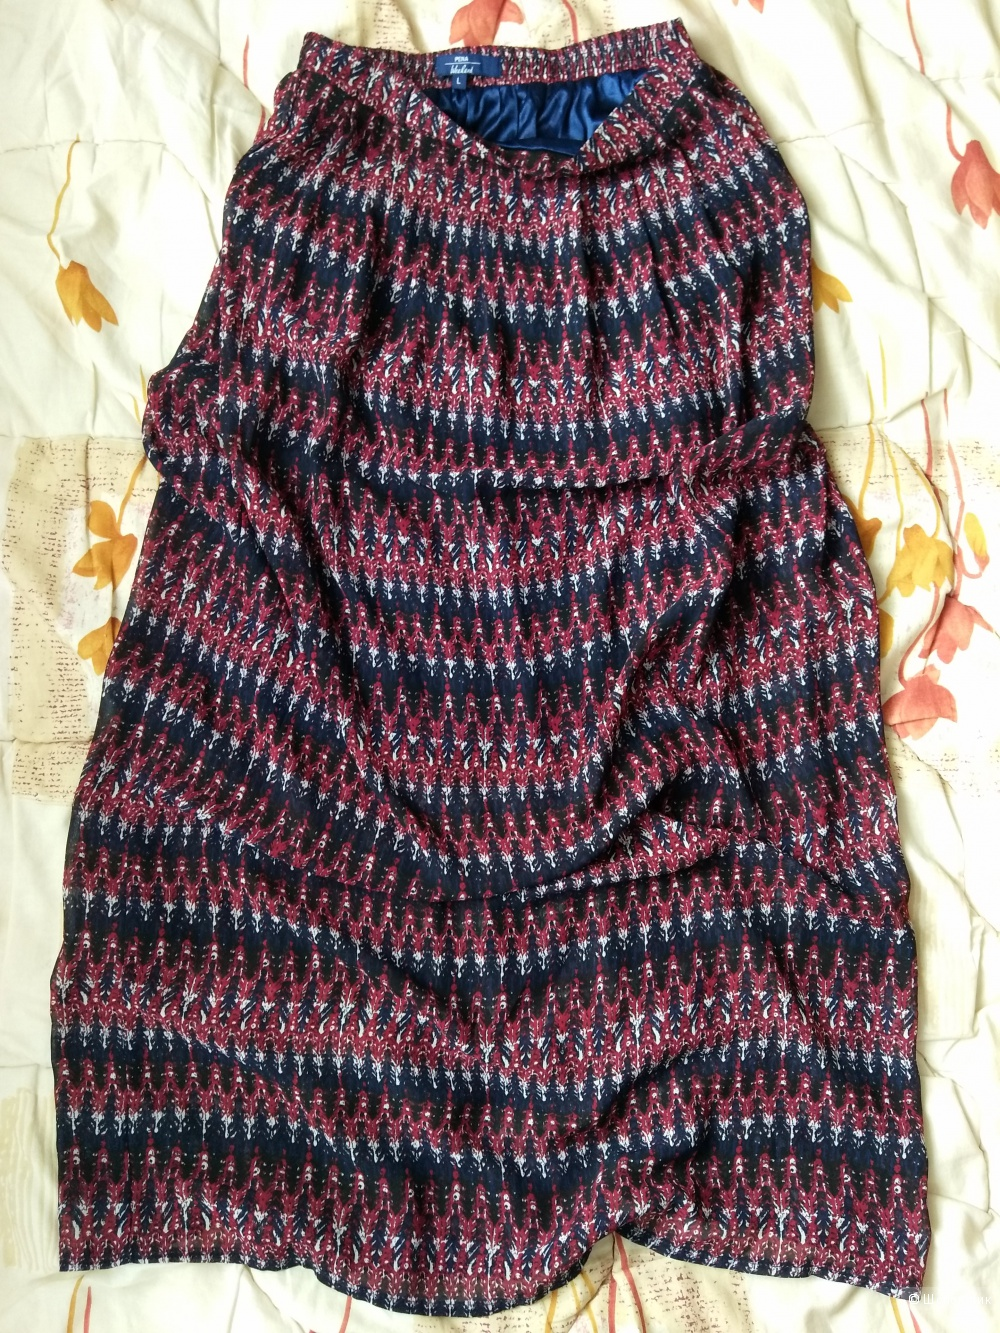 Шифоновая юбка Pena Weekend 44-46 размер